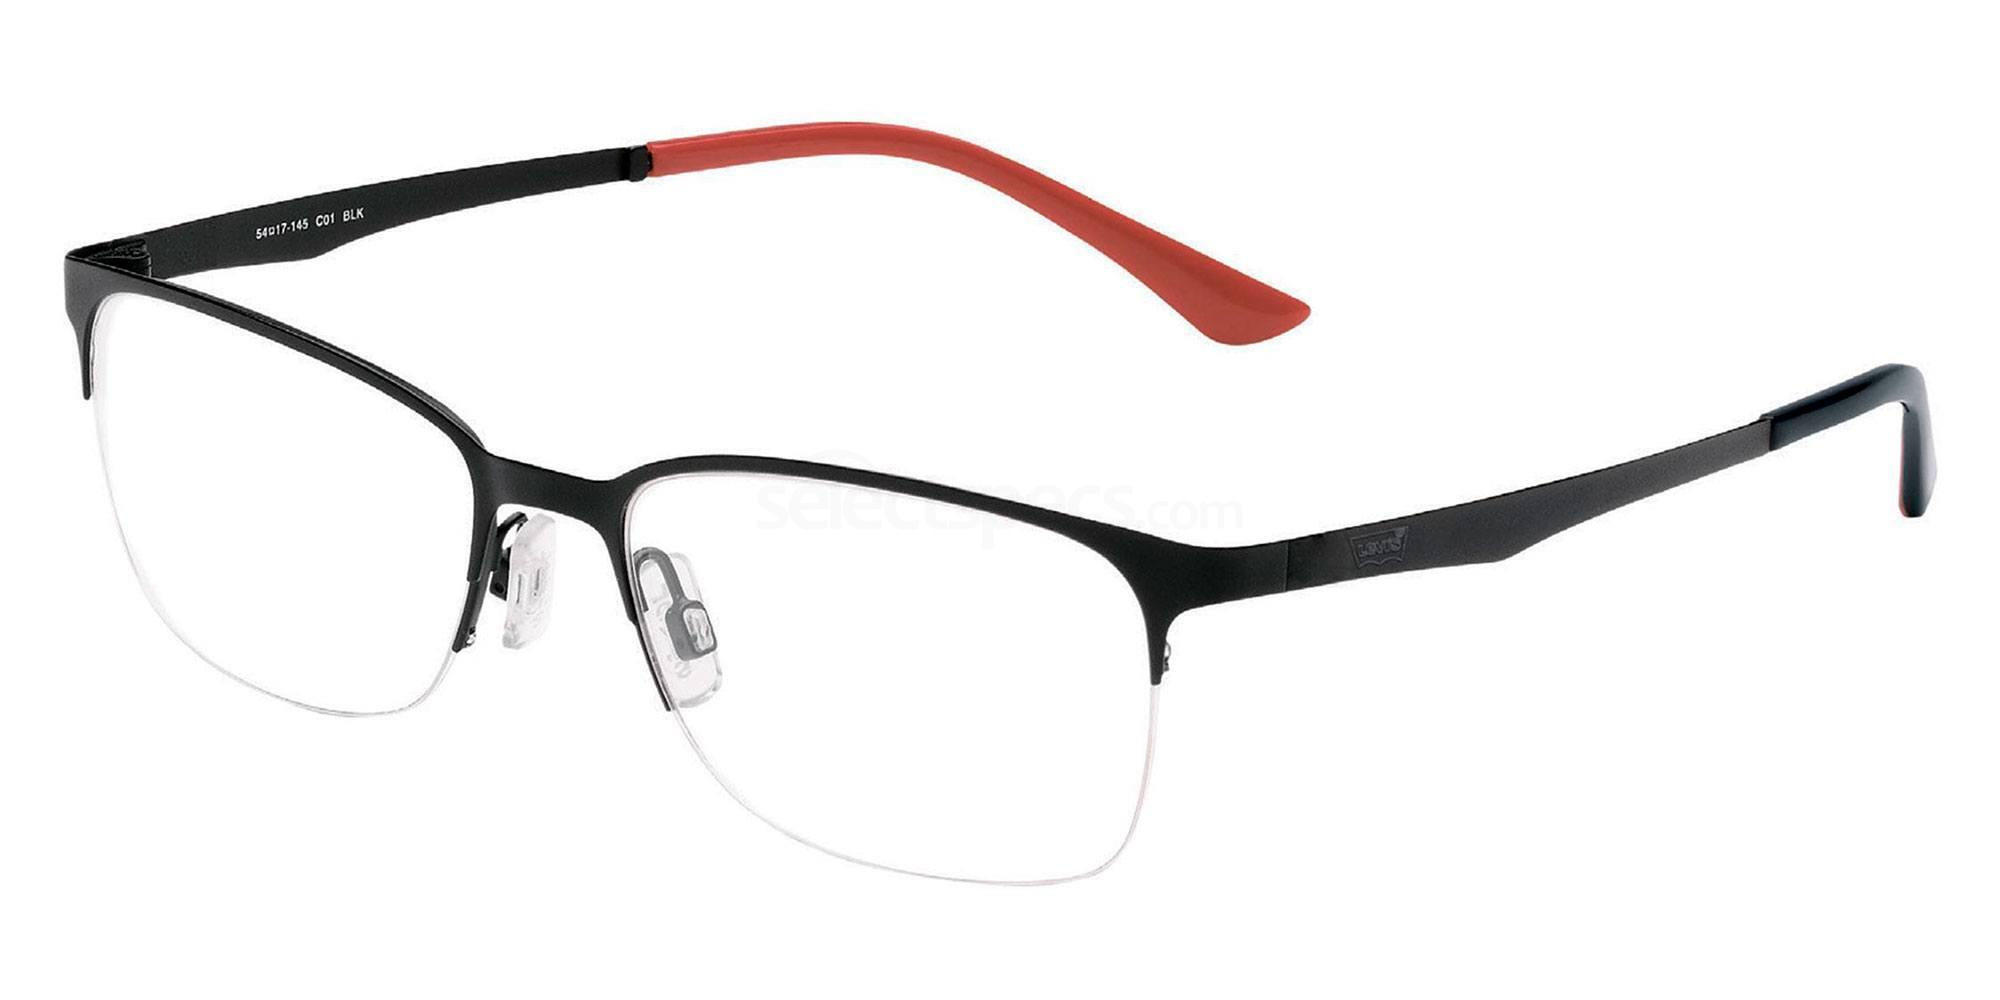 01 BLK LS104 Glasses, Levi's Eyewear